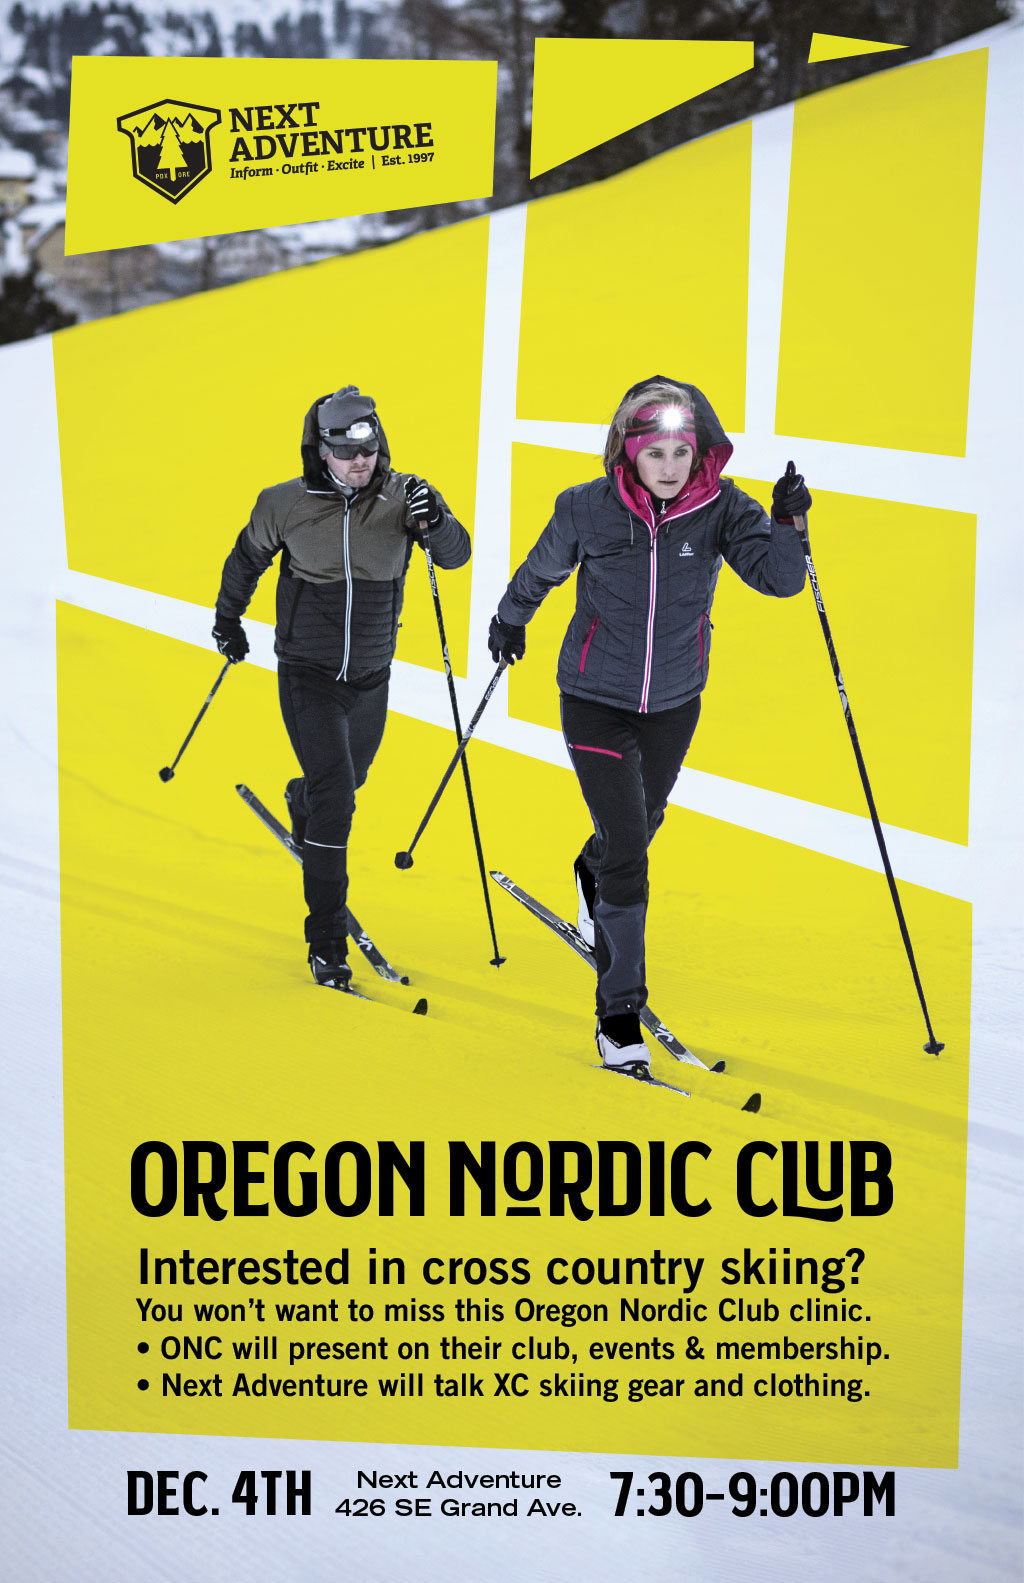 Oregon Nordic Club